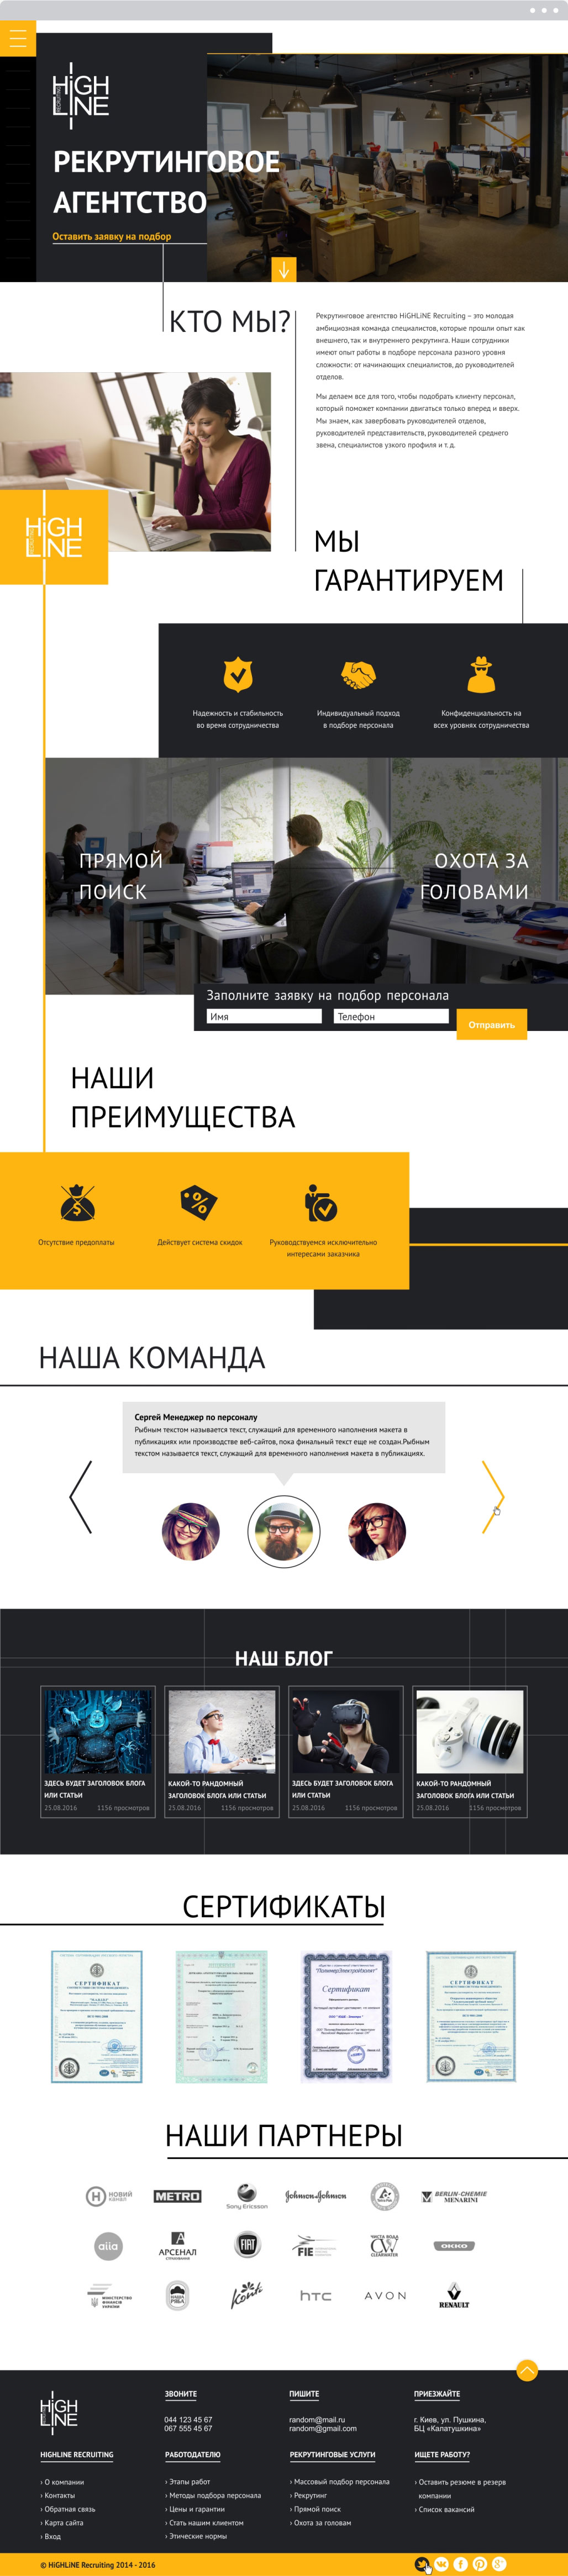 Разработка сайта H-Line